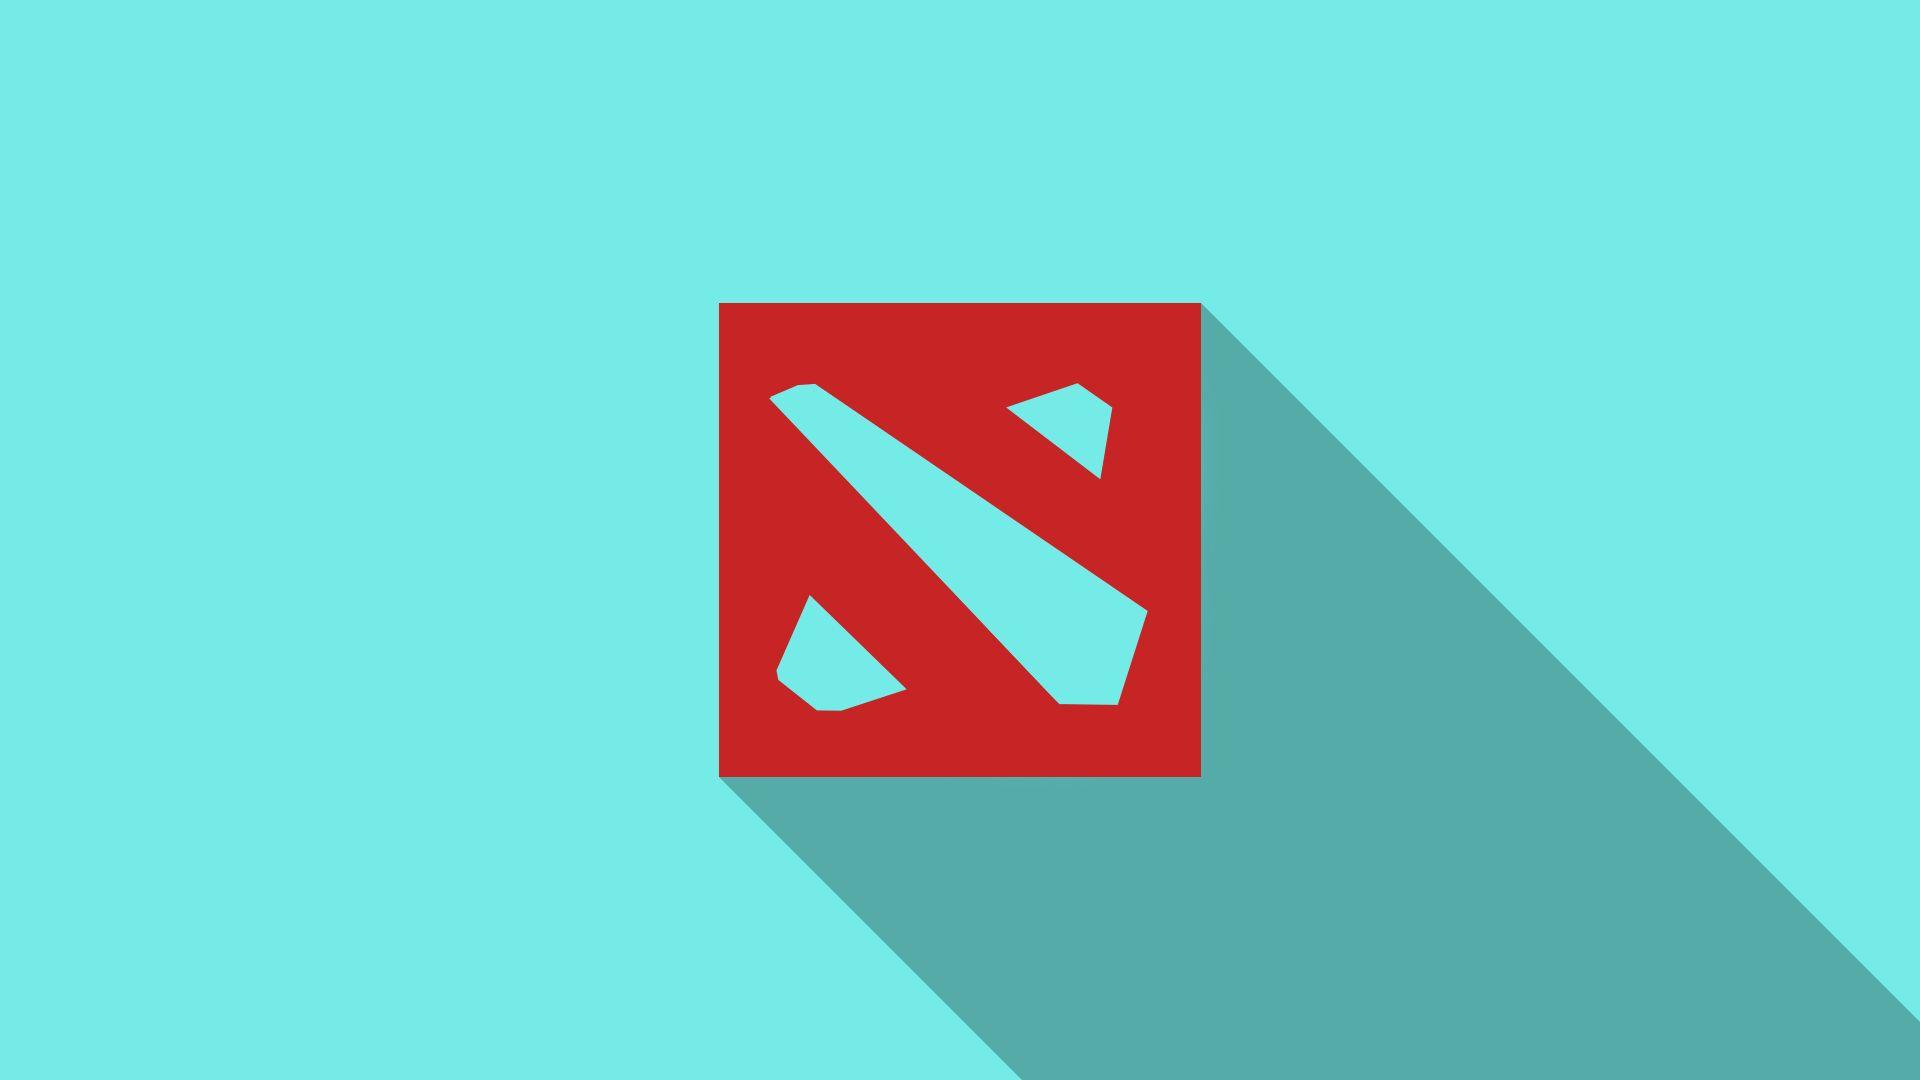 dota 2 logo wallpaper hd for desktop